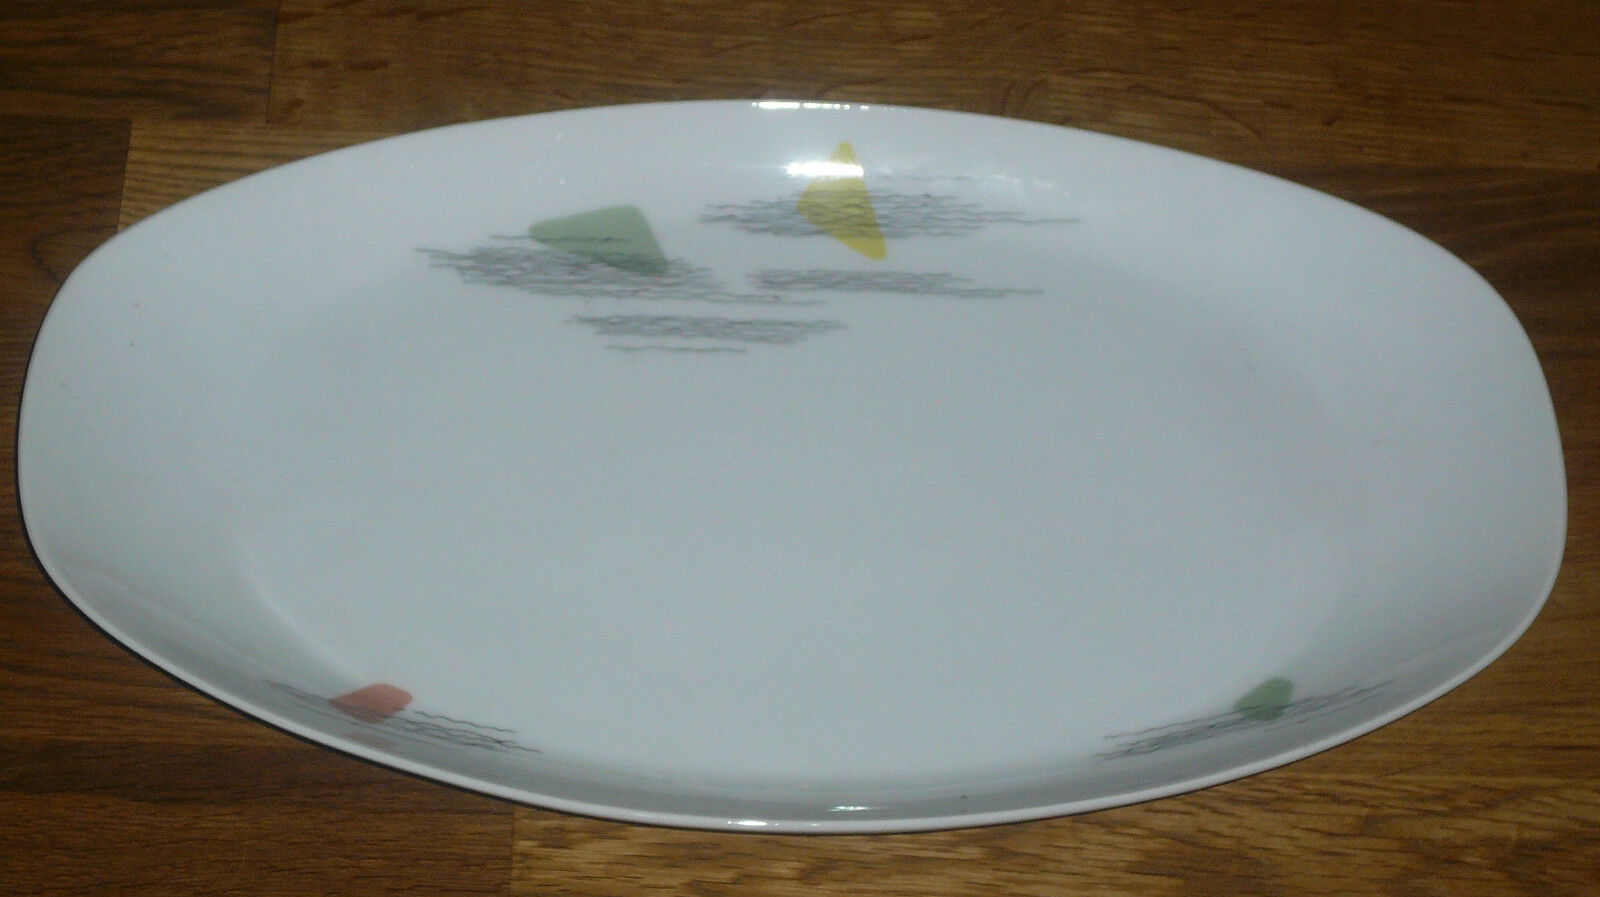 1 Platte Platte Platte  35,5 cm   21,5 cm   Arzberg Form 2025  Löffelhardt   OHNE  Goldrand | Großer Verkauf  b29fdb